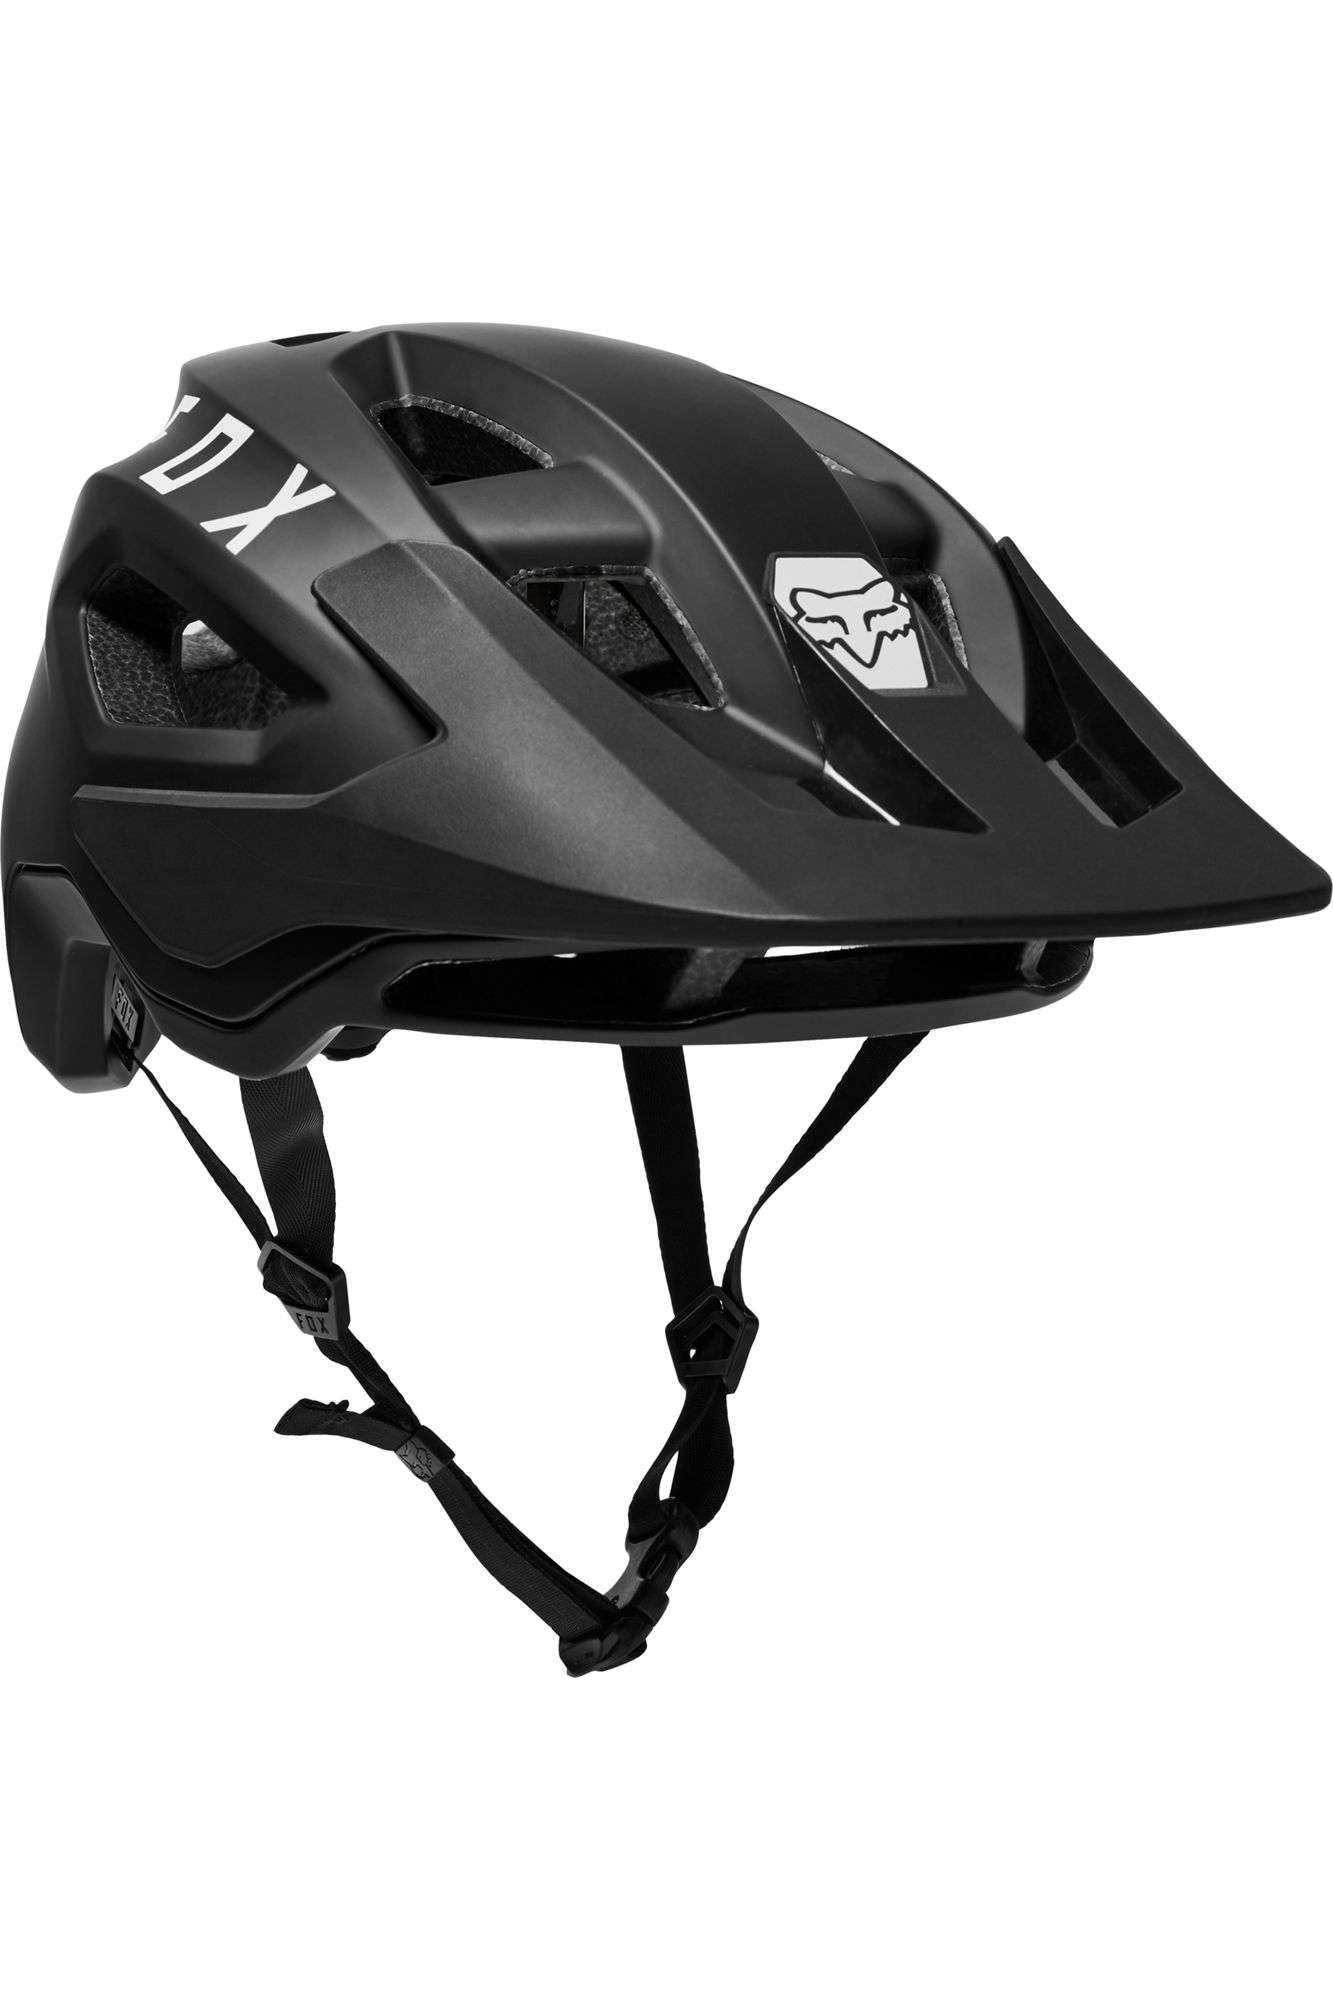 Casco bici FOX SPEEDFRAME MIPS negro